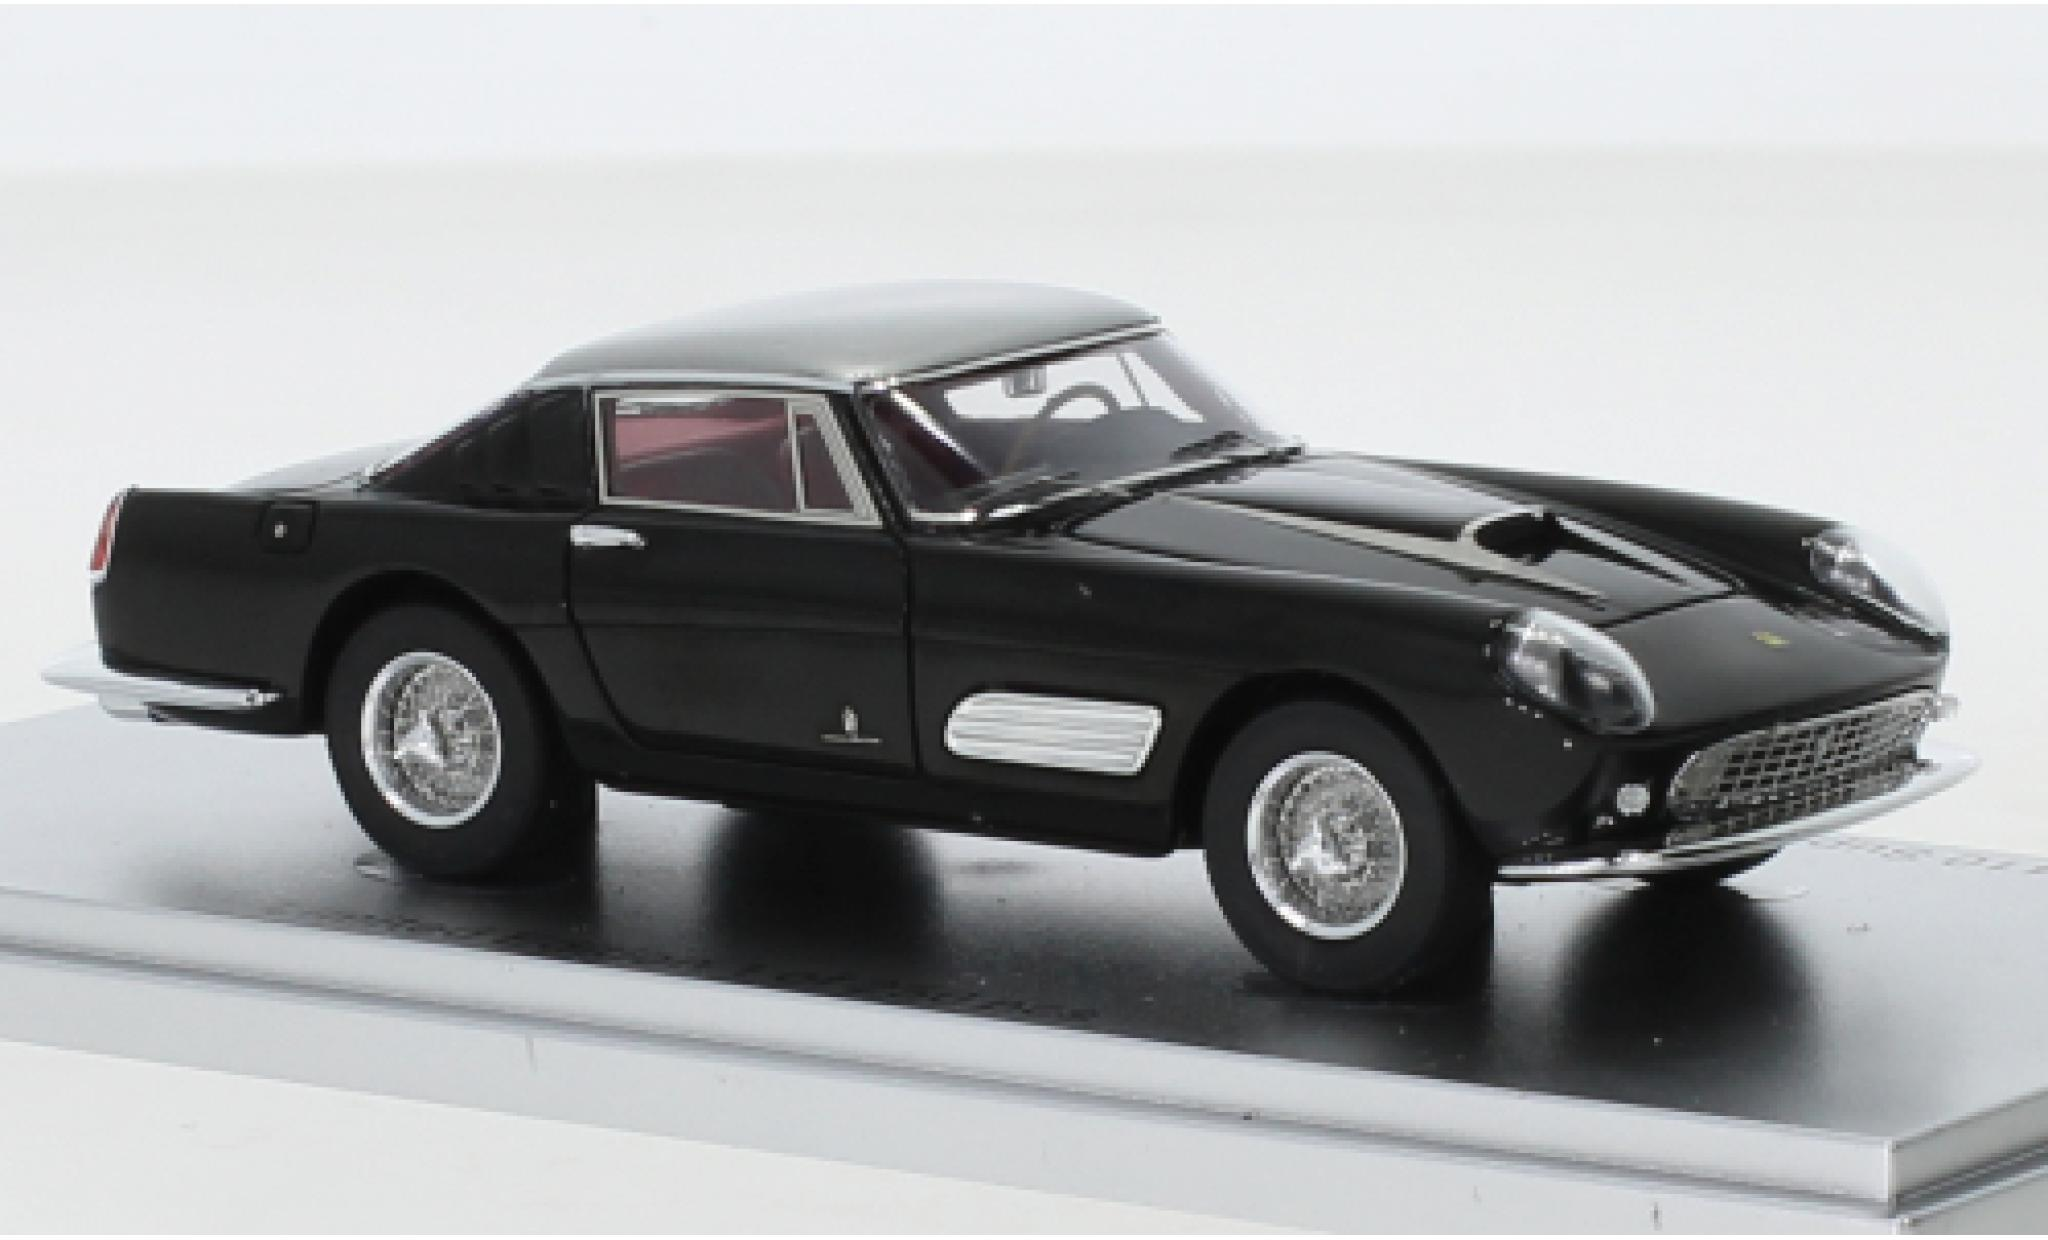 Ferrari 410 1/43 Kess Superamerica Series III Pininfarina Coupe black/grey 1958